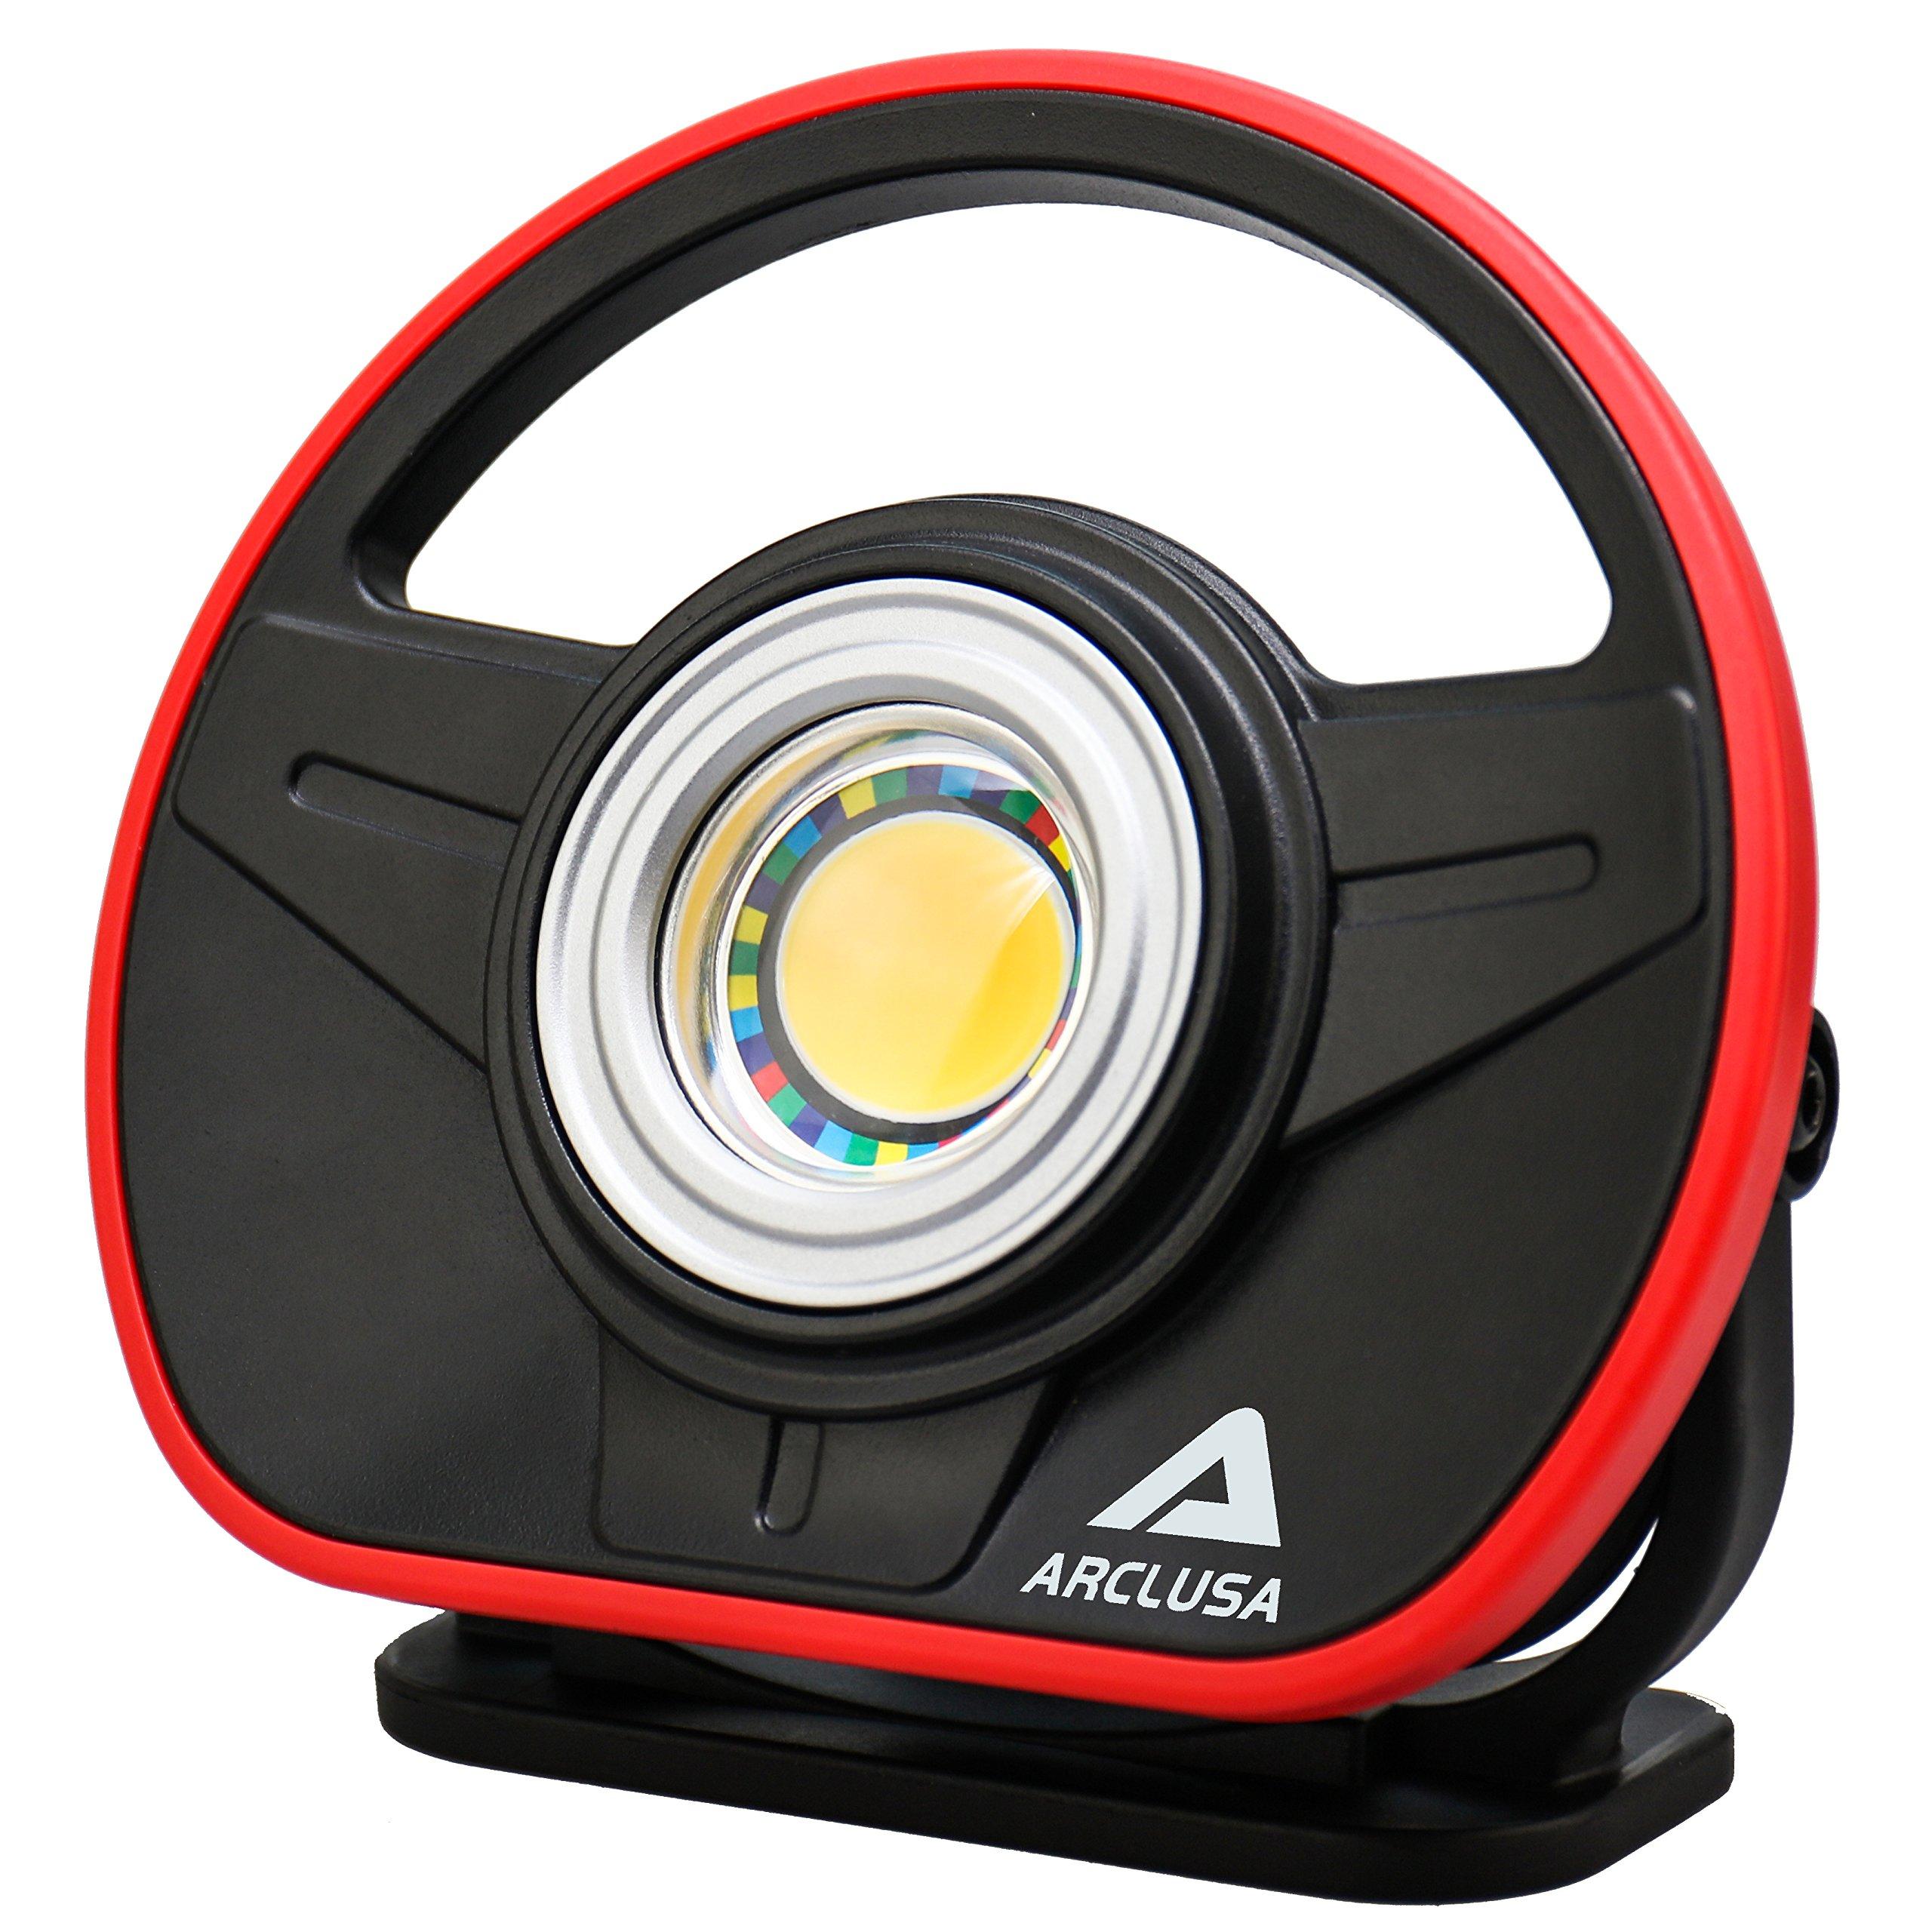 Arclusa COB LED Rechargeable Sunlight Color Match Paint Work Light Adjustable Holder Magnet Bottom Flood Light(1000 Lumen Color Match)